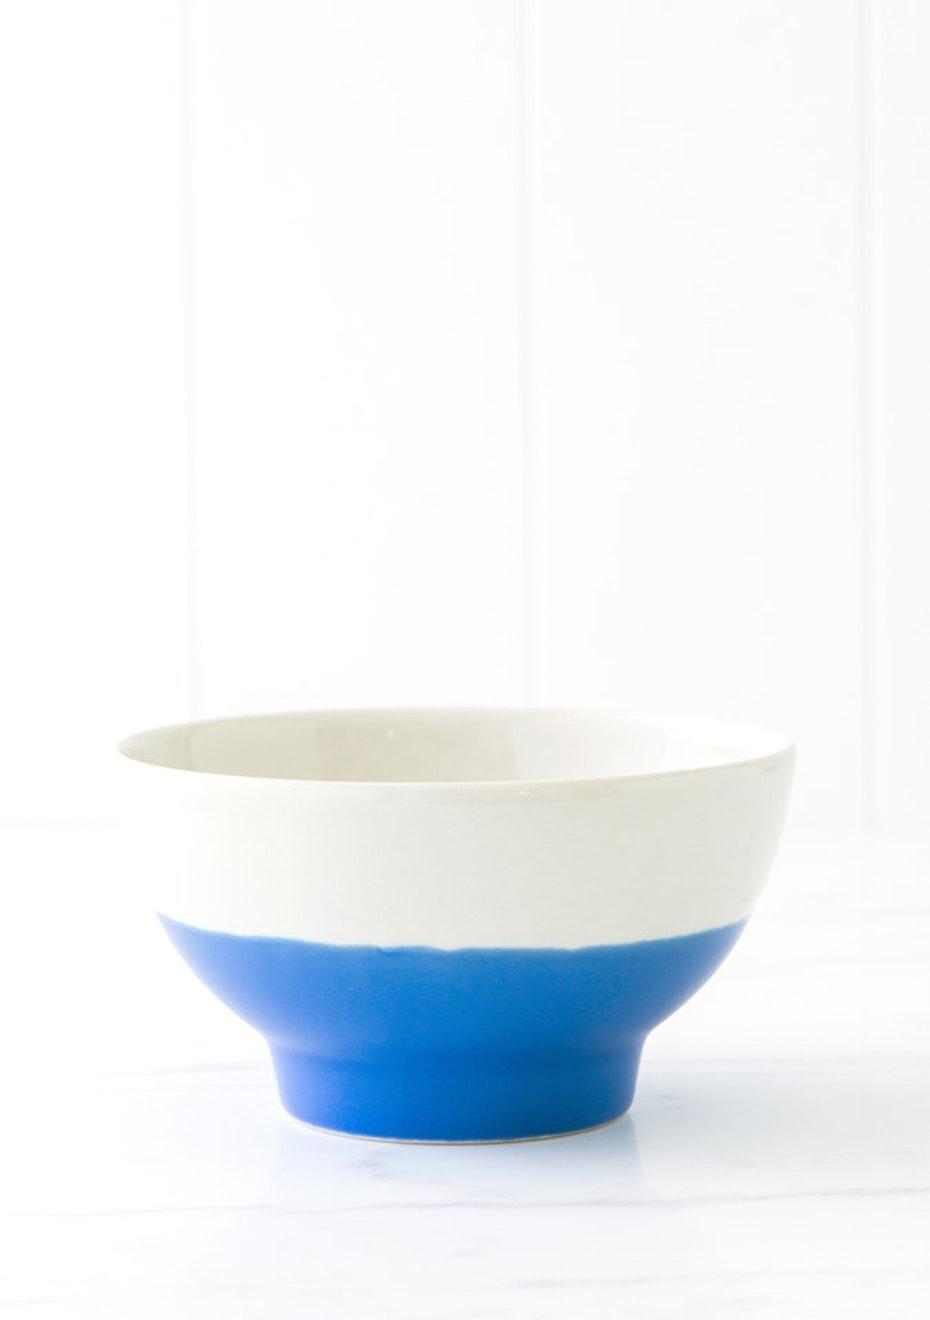 Nest - Tides Breakfast Bowl Sapphire